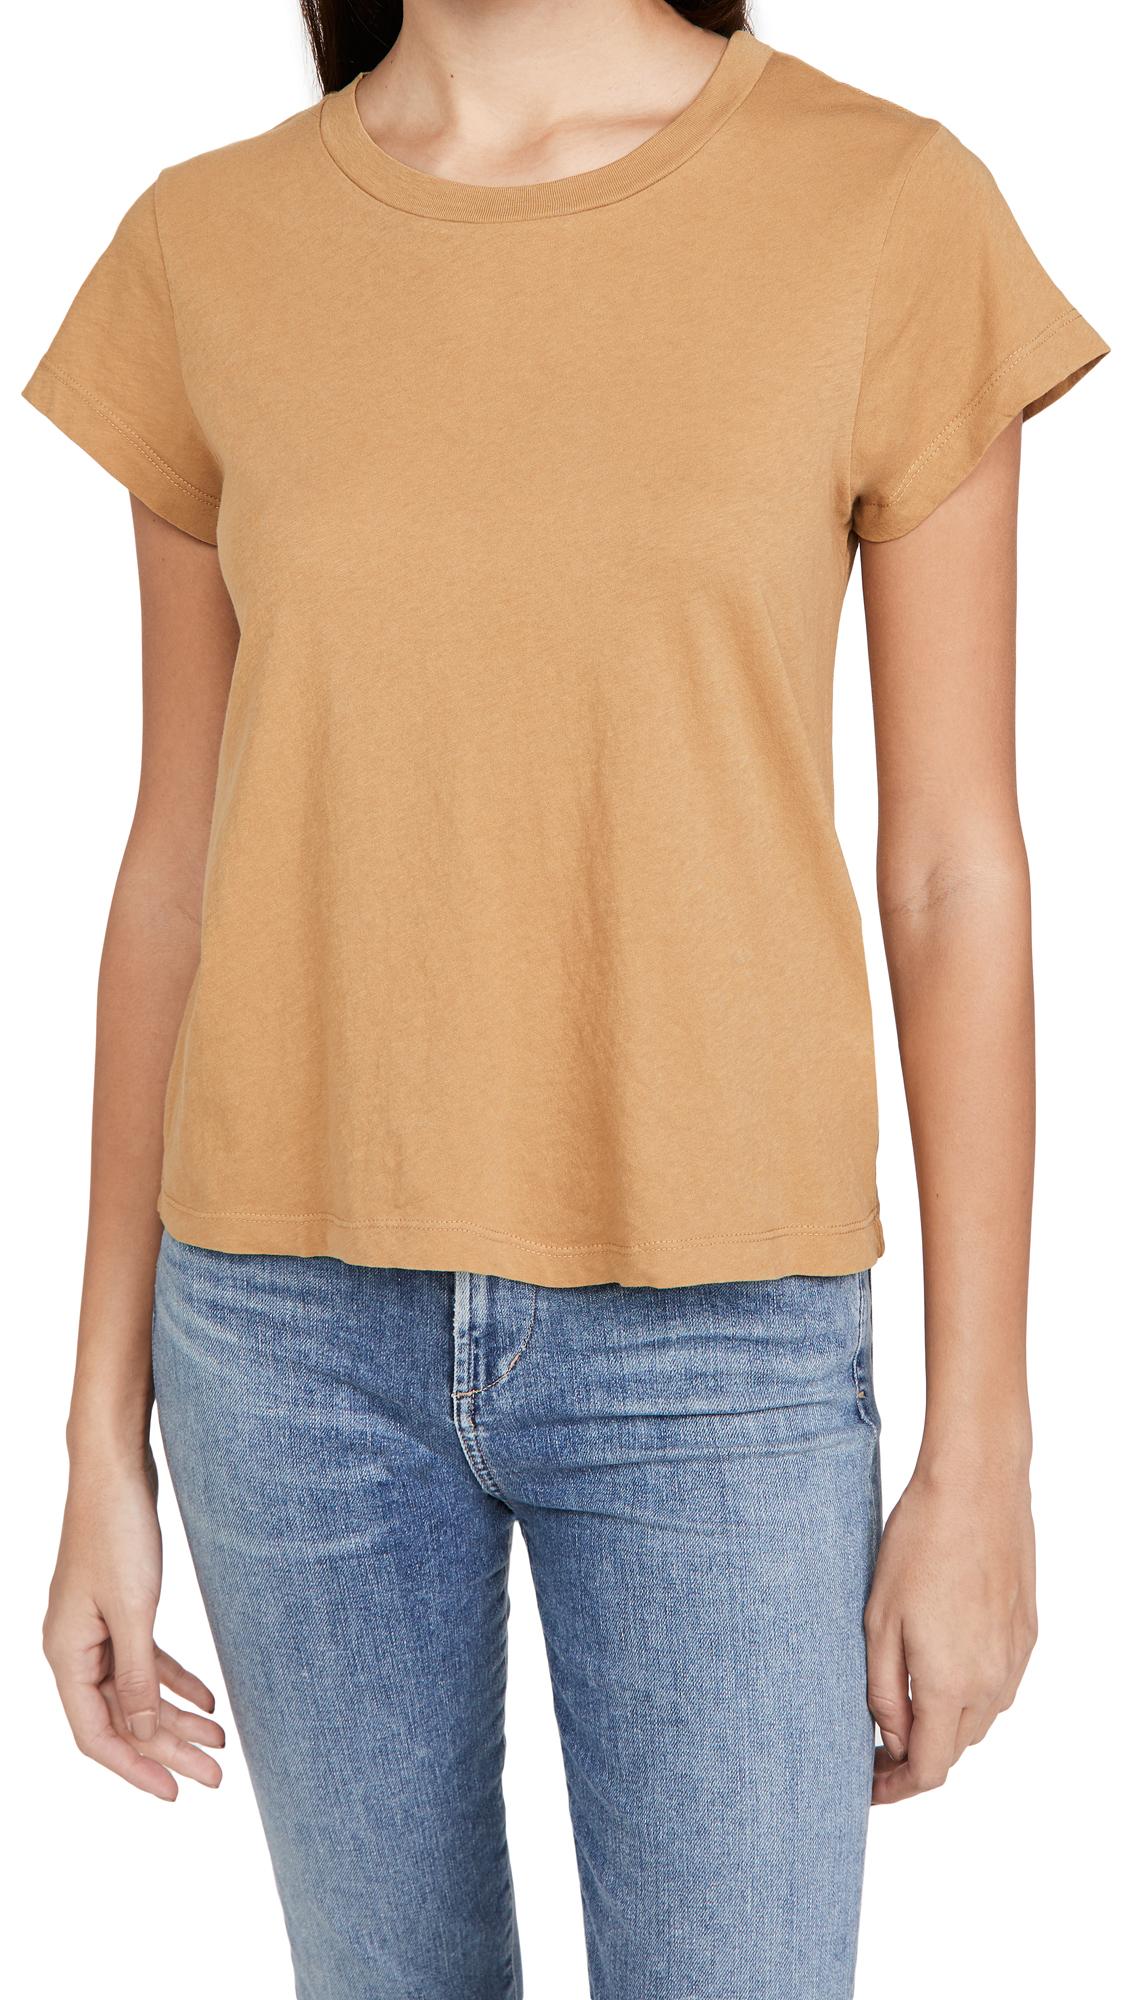 Citizens of Humanity Juliette Slim T-Shirt